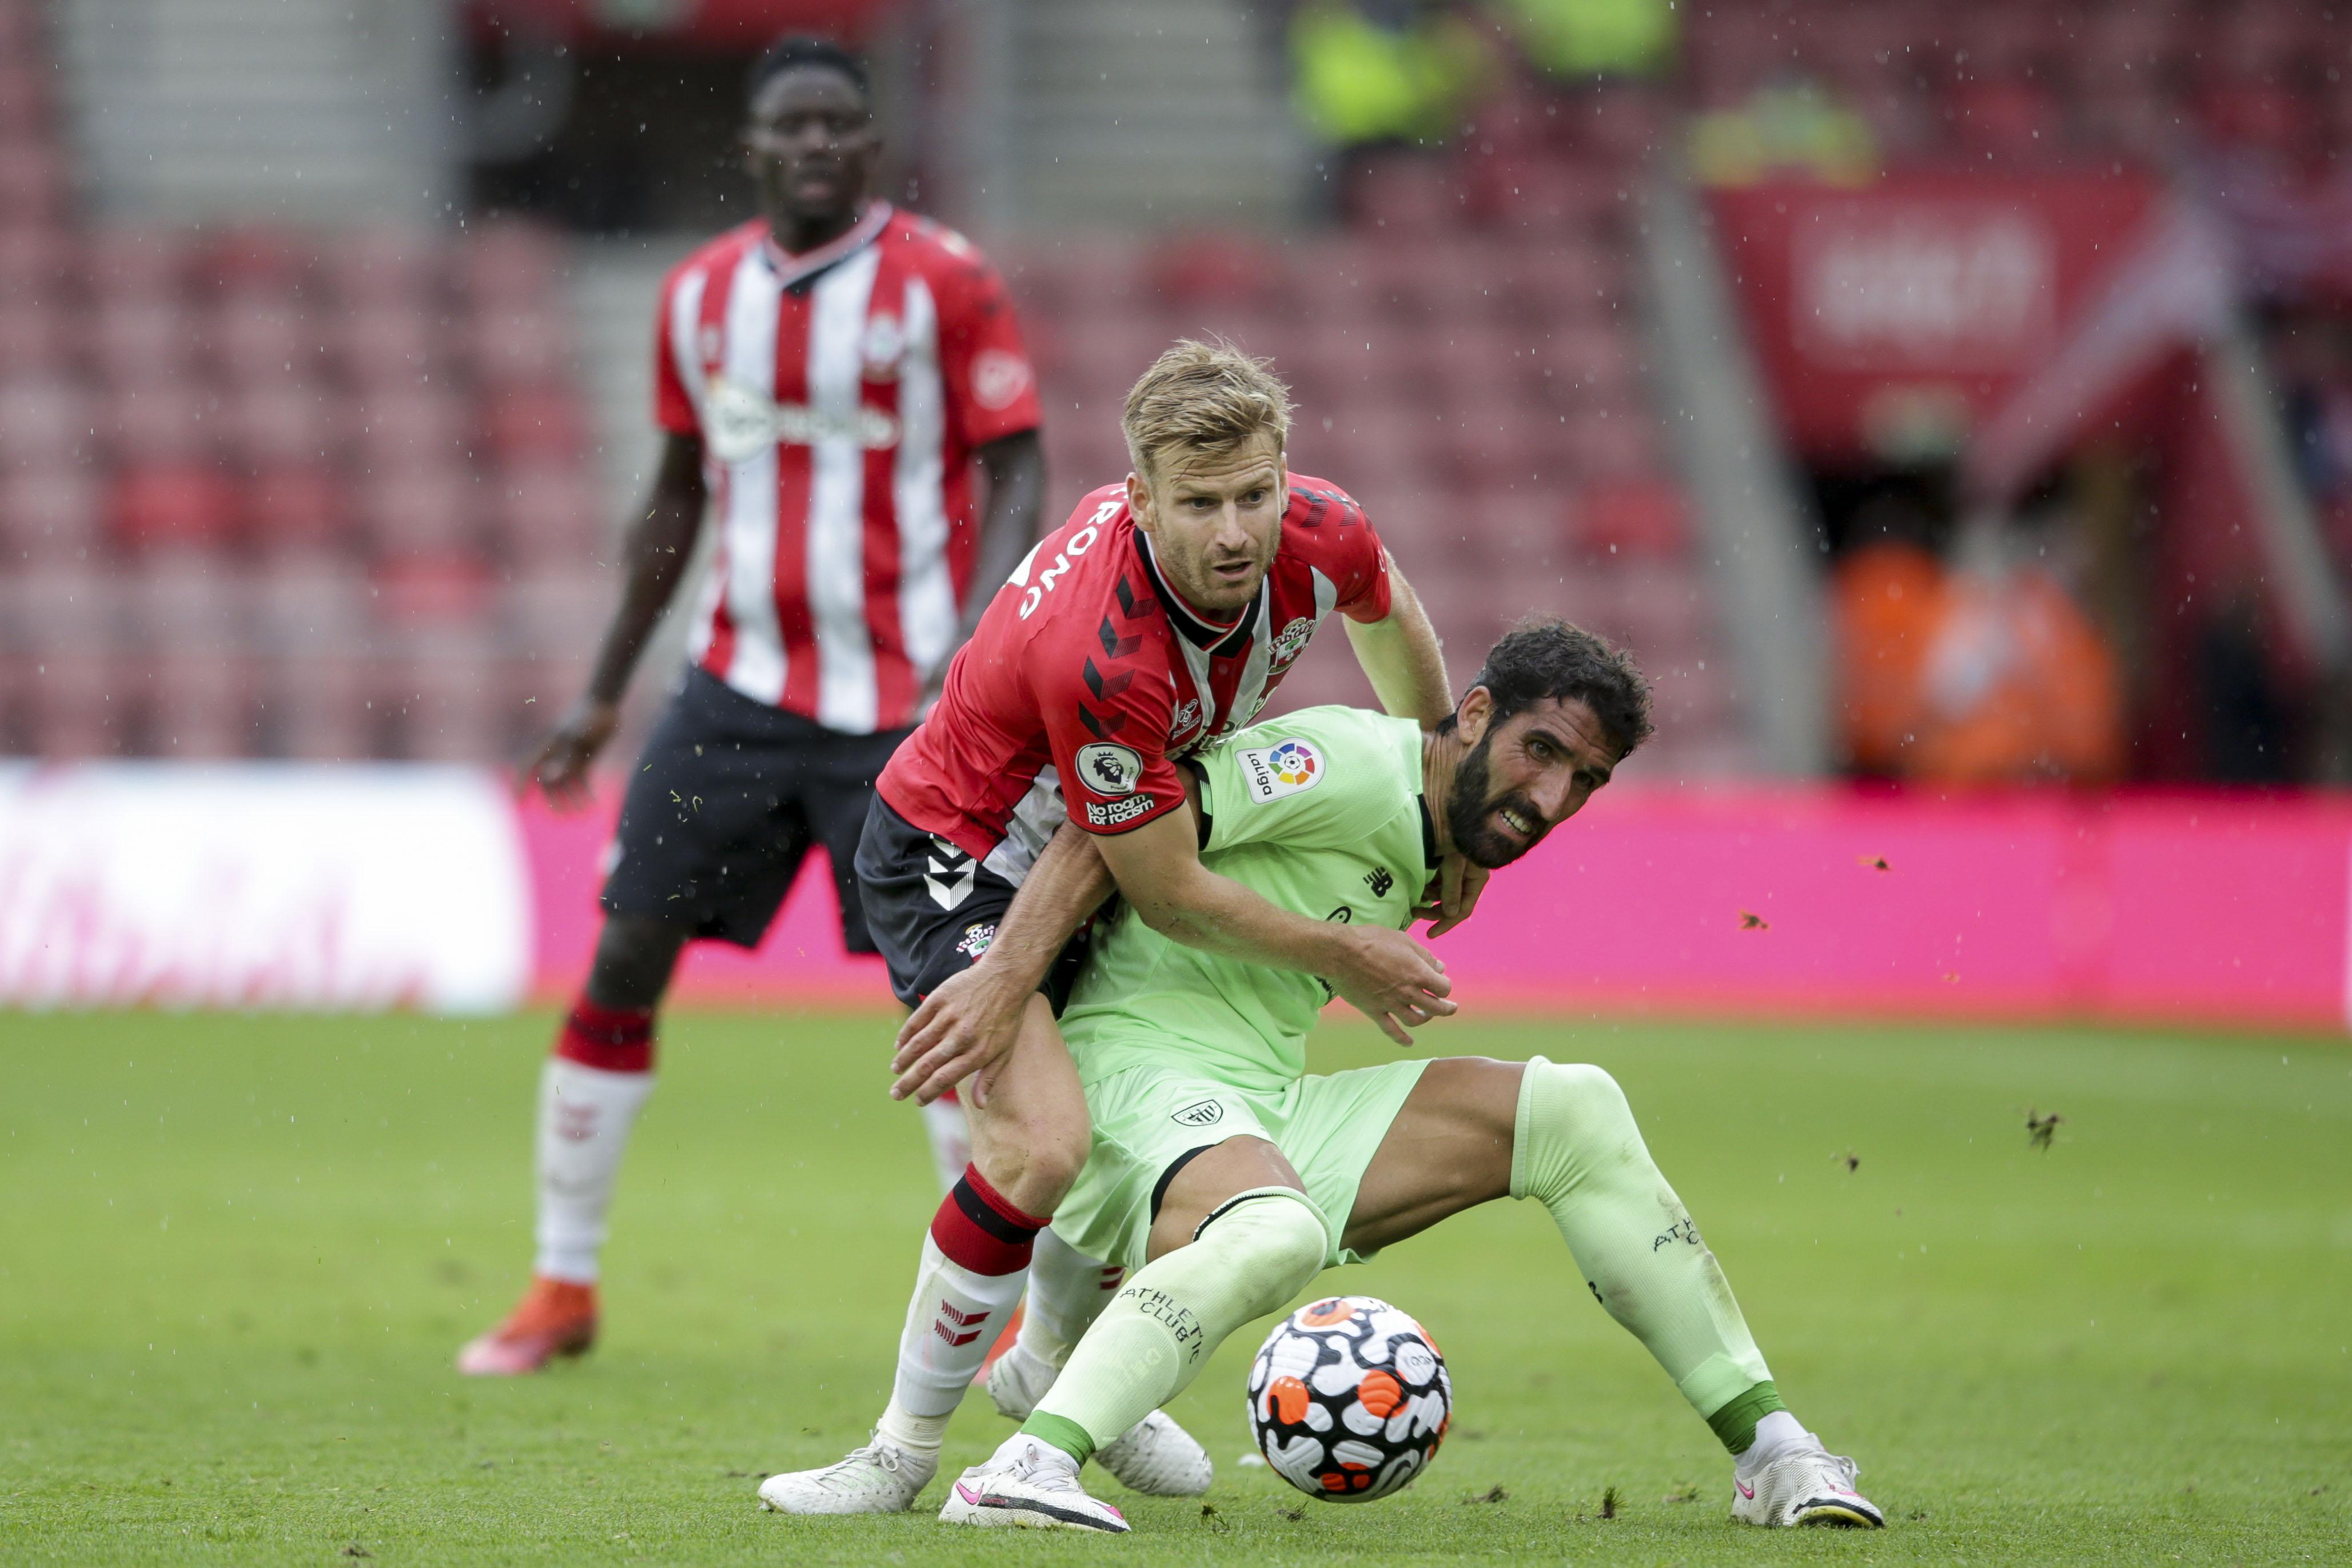 Southampton, West Ham, injury update, team news, Stuart Armstrong, Theo Walcott, Shane Long, Premier League